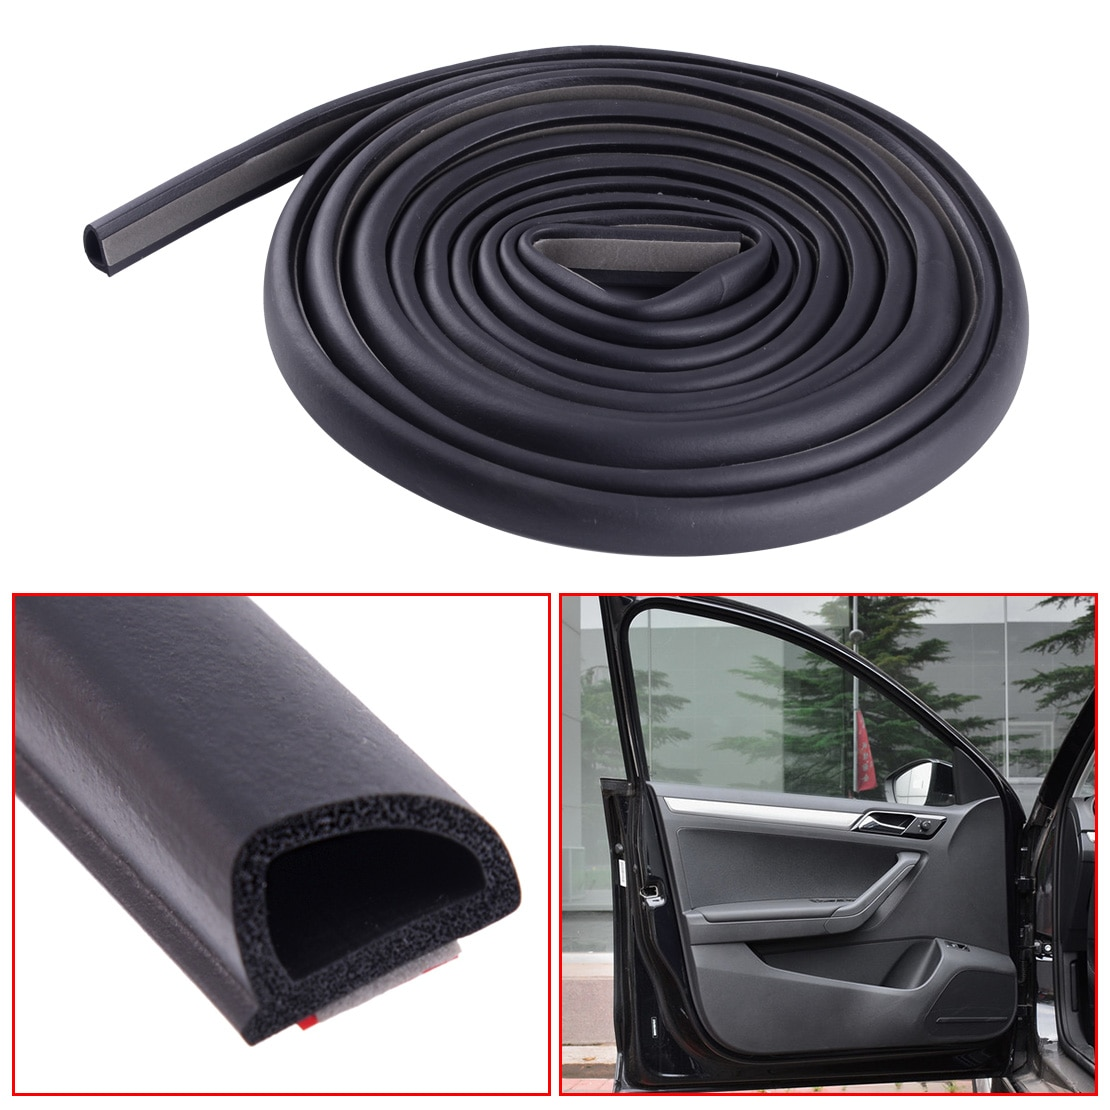 CITALL Universal 4m tira de sellado para puerta de coche de aislamiento de goma inclinado D en forma para maletero Hood borde Accesorios